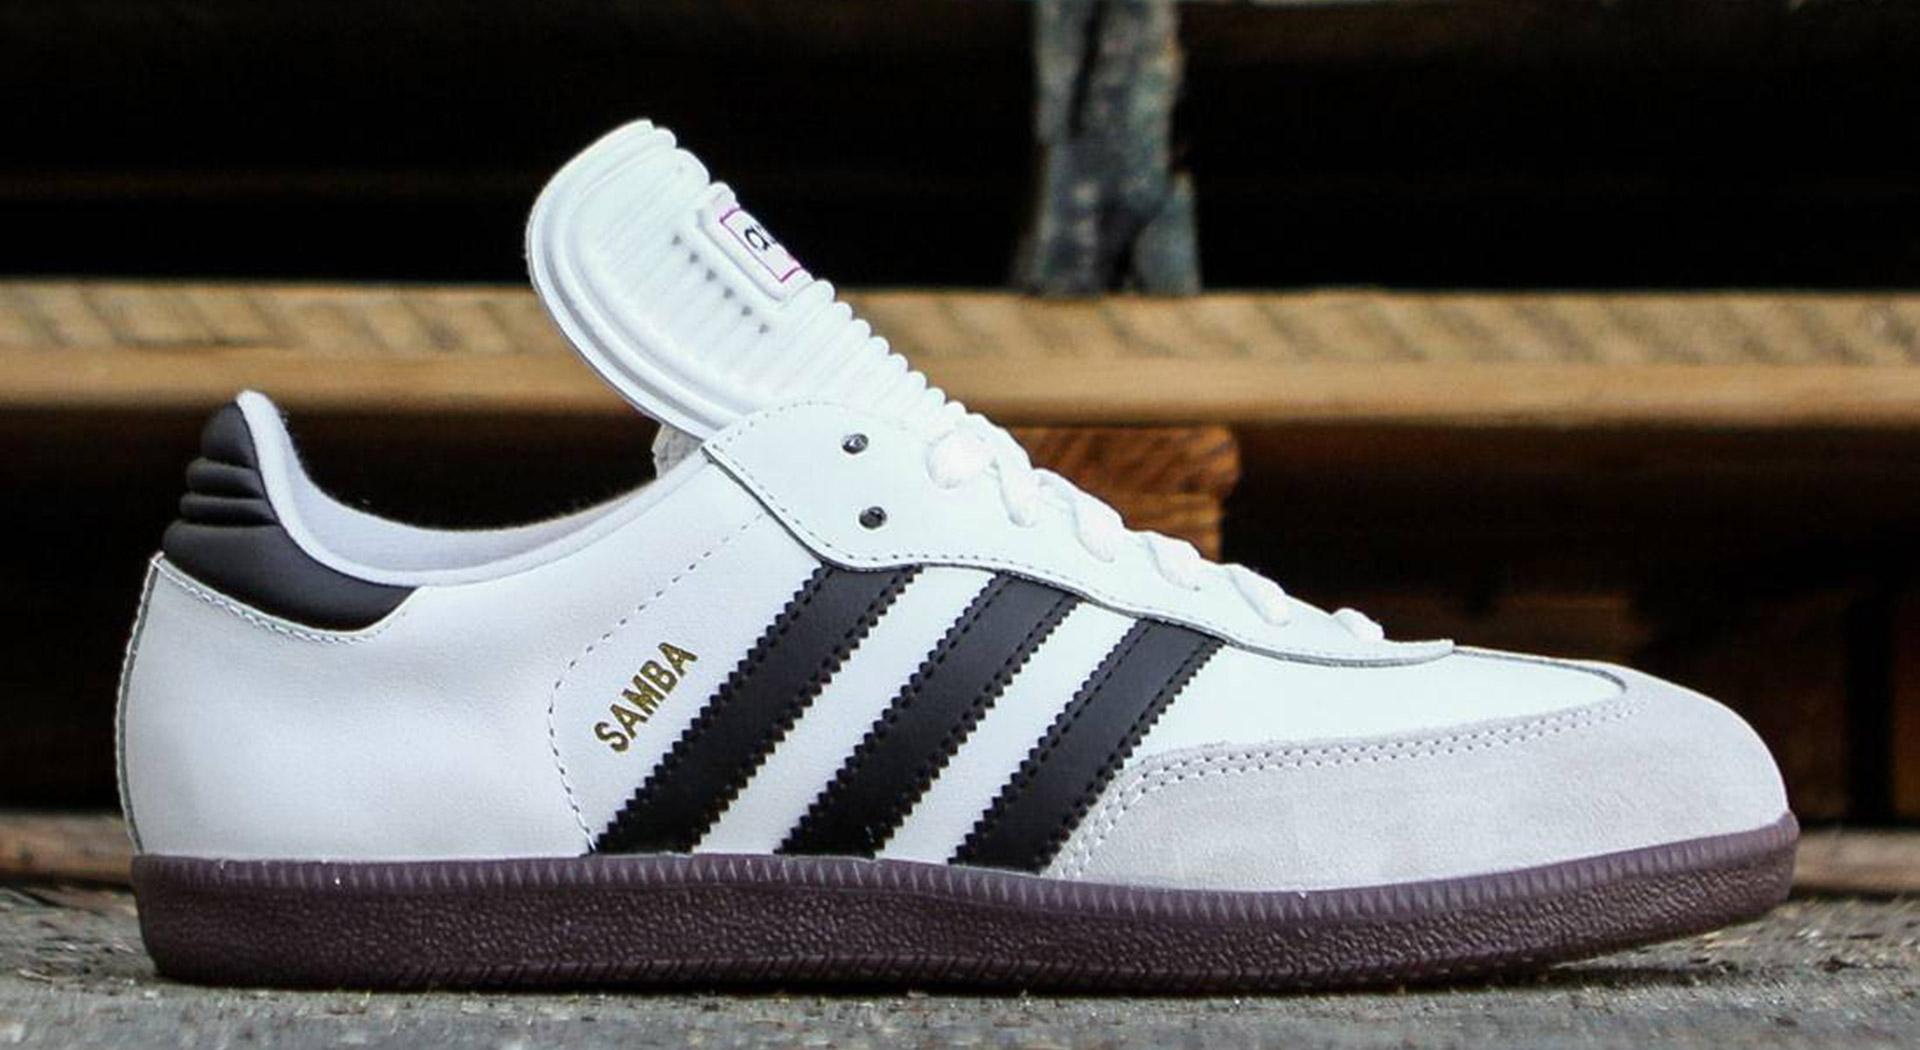 Adidas Samba white